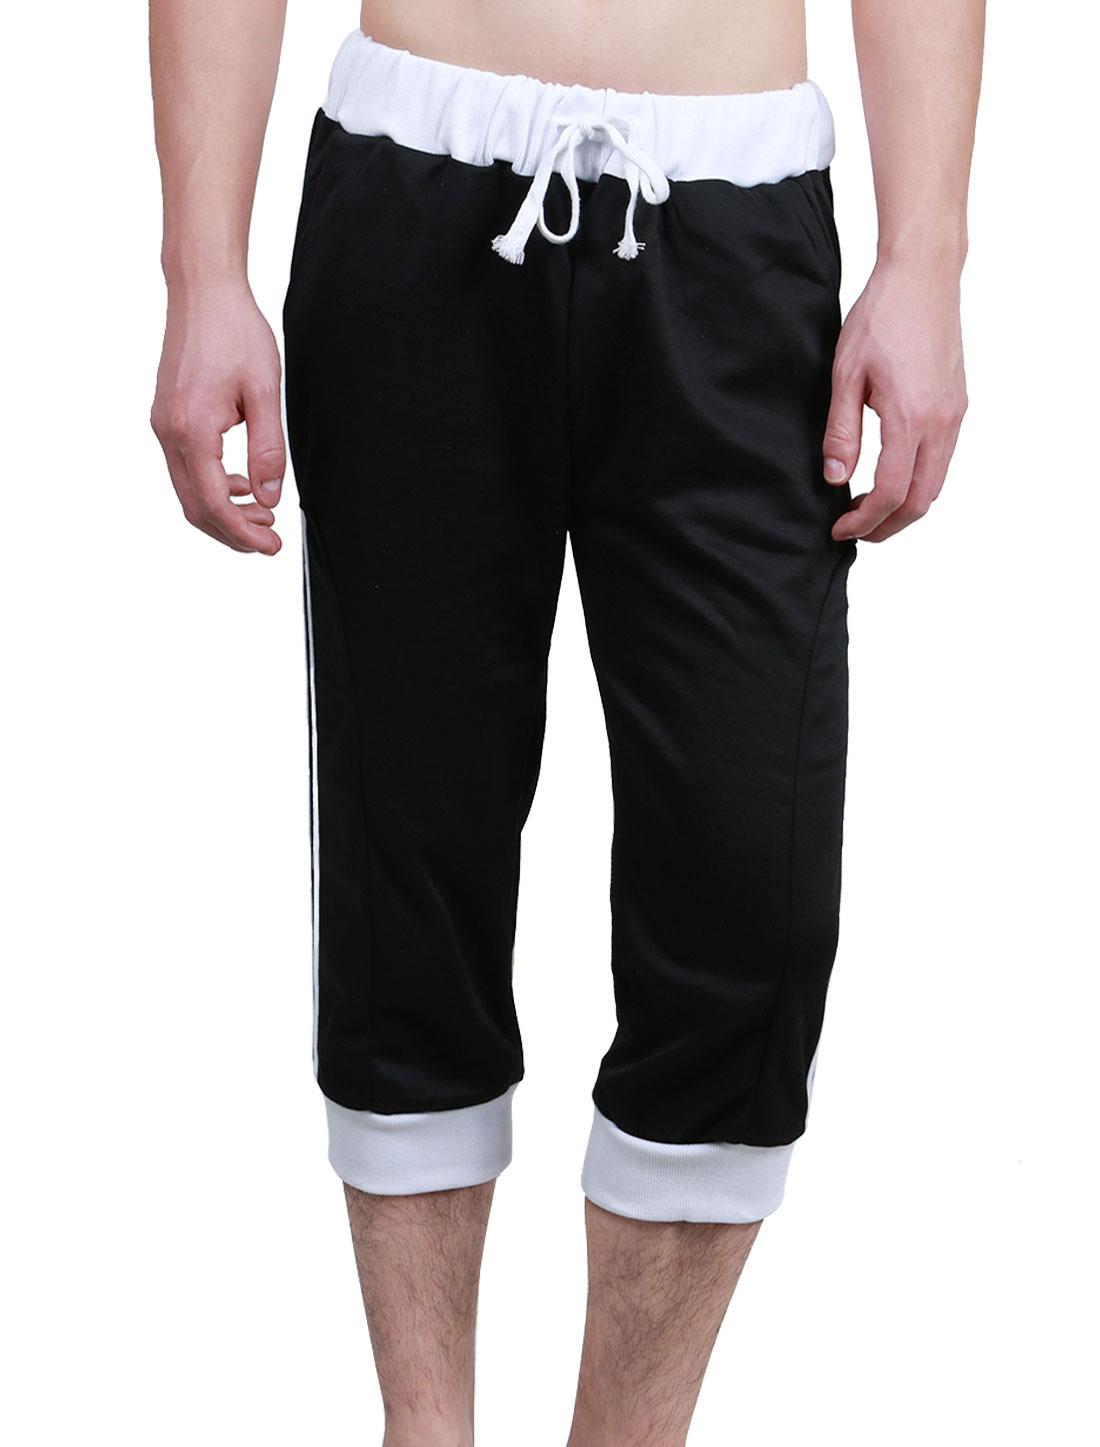 Men Drawstring Rib Waist 2-pocket Sport Pants ShortsBlack White W32